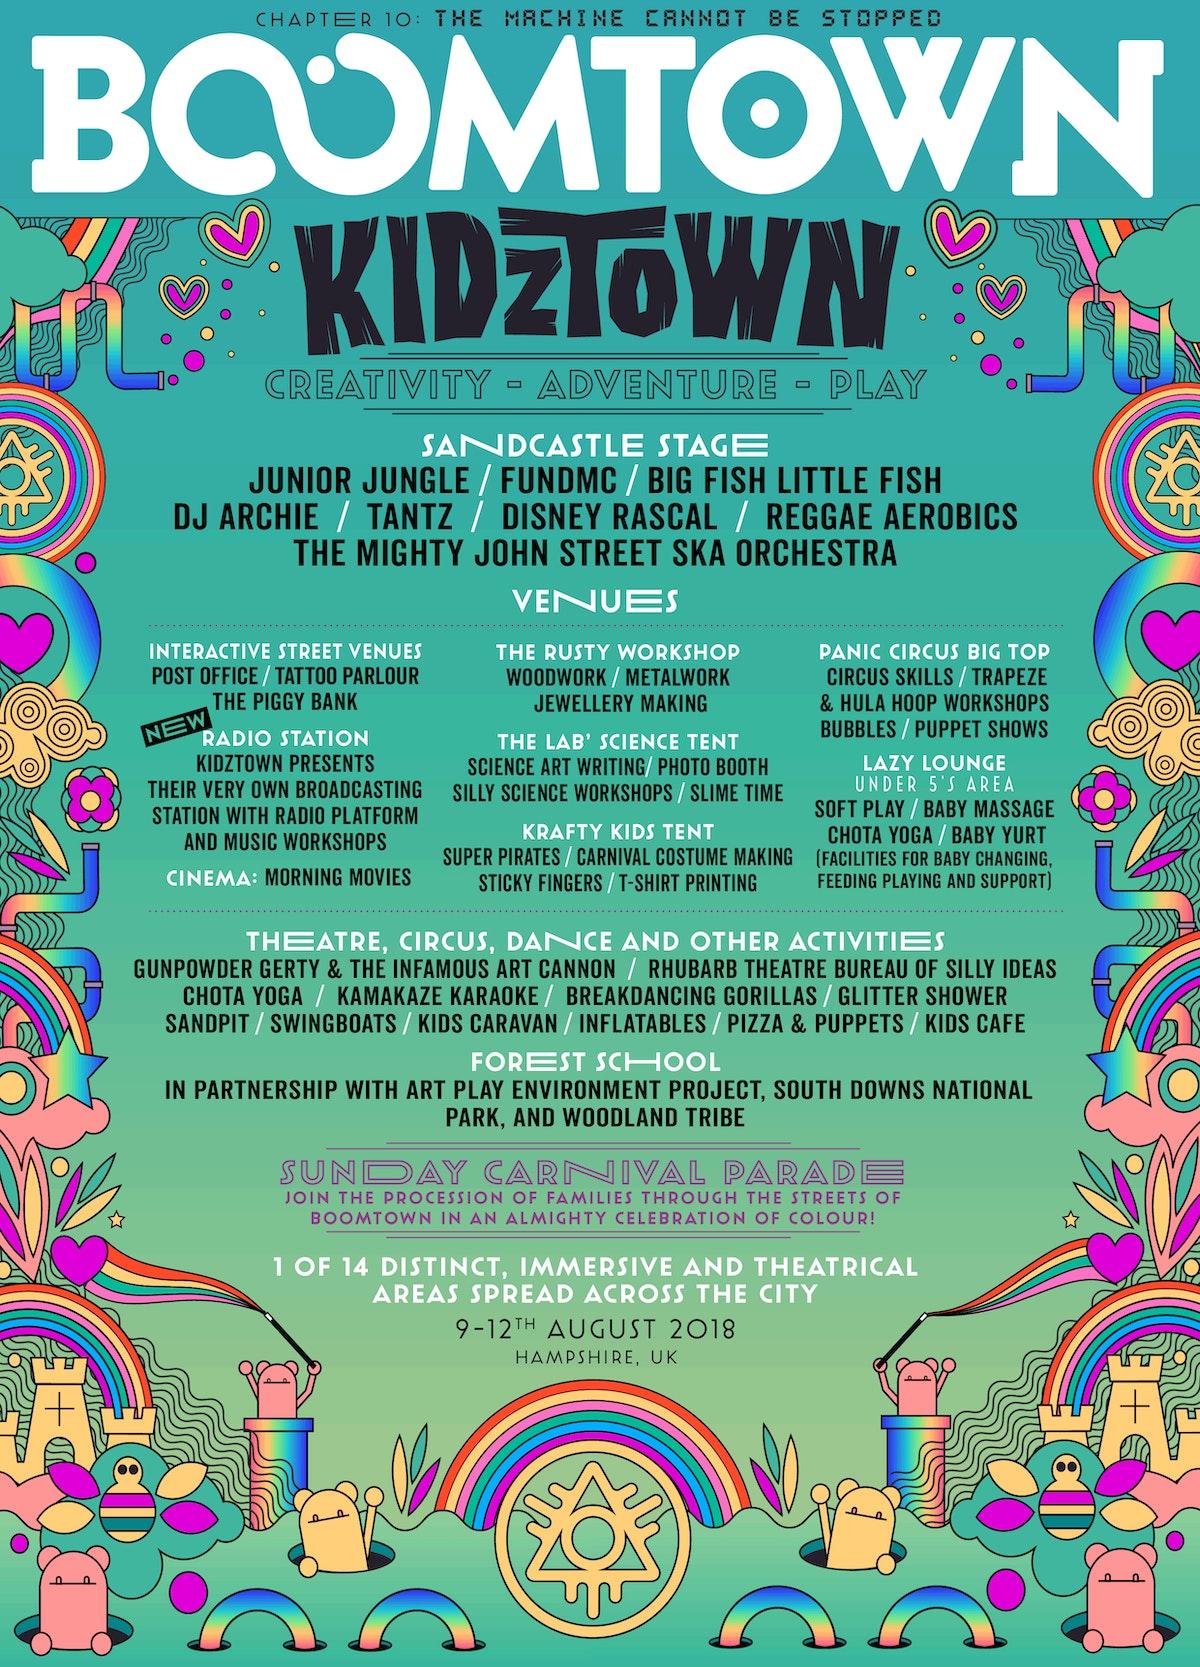 548f7e7e8b686 District Announcement: Kidztown | Boomtown Chapter 11 - A Radical ...